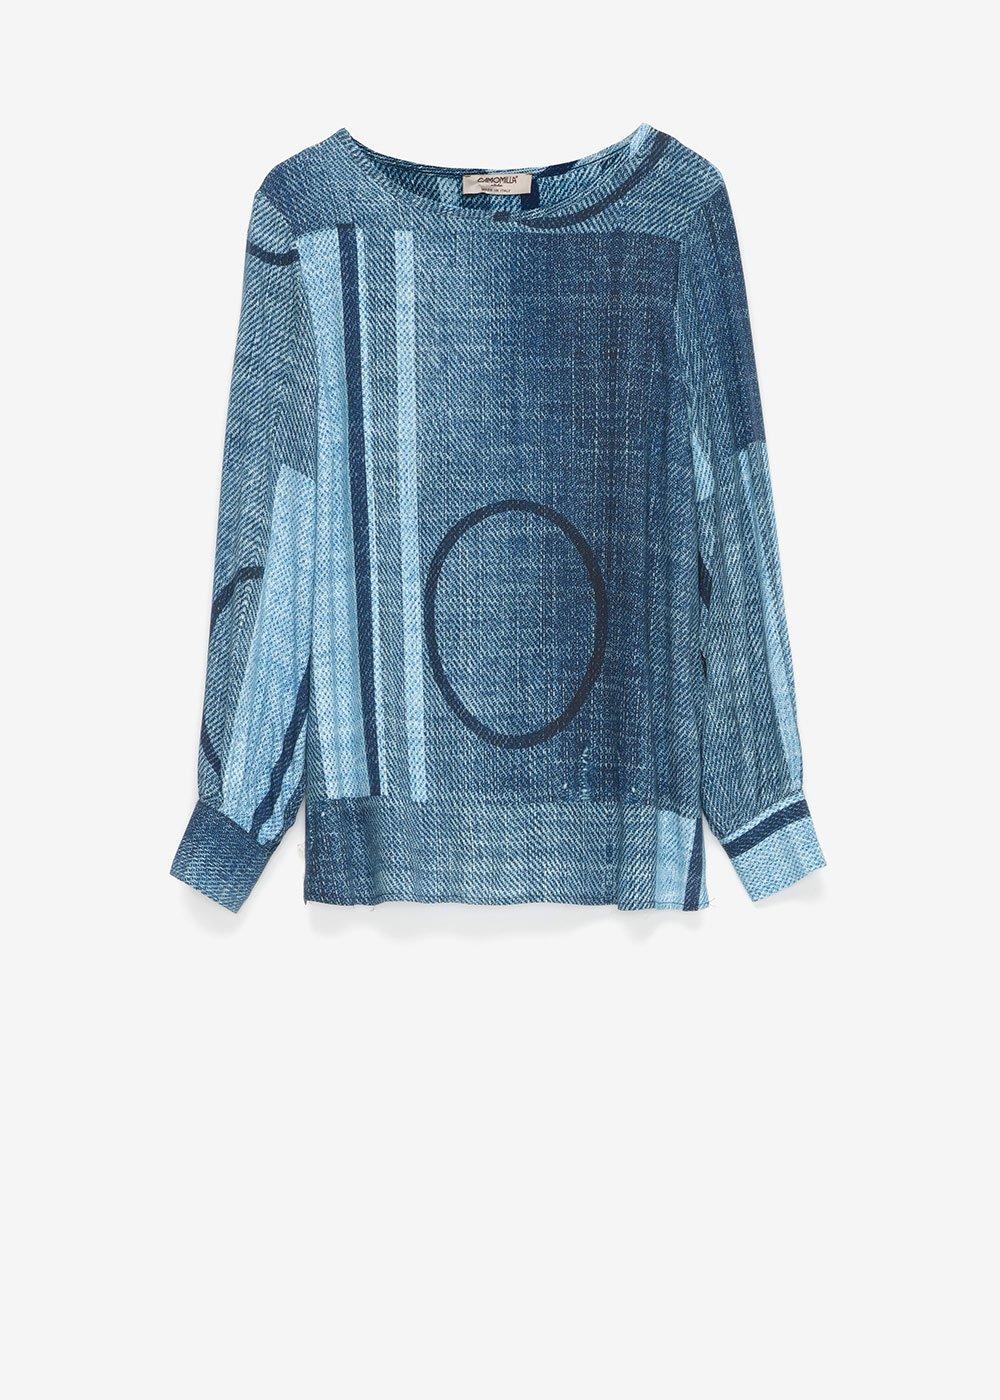 T-shirt Sophie effetto denim - Oltremare / Fog Fantasia - Donna